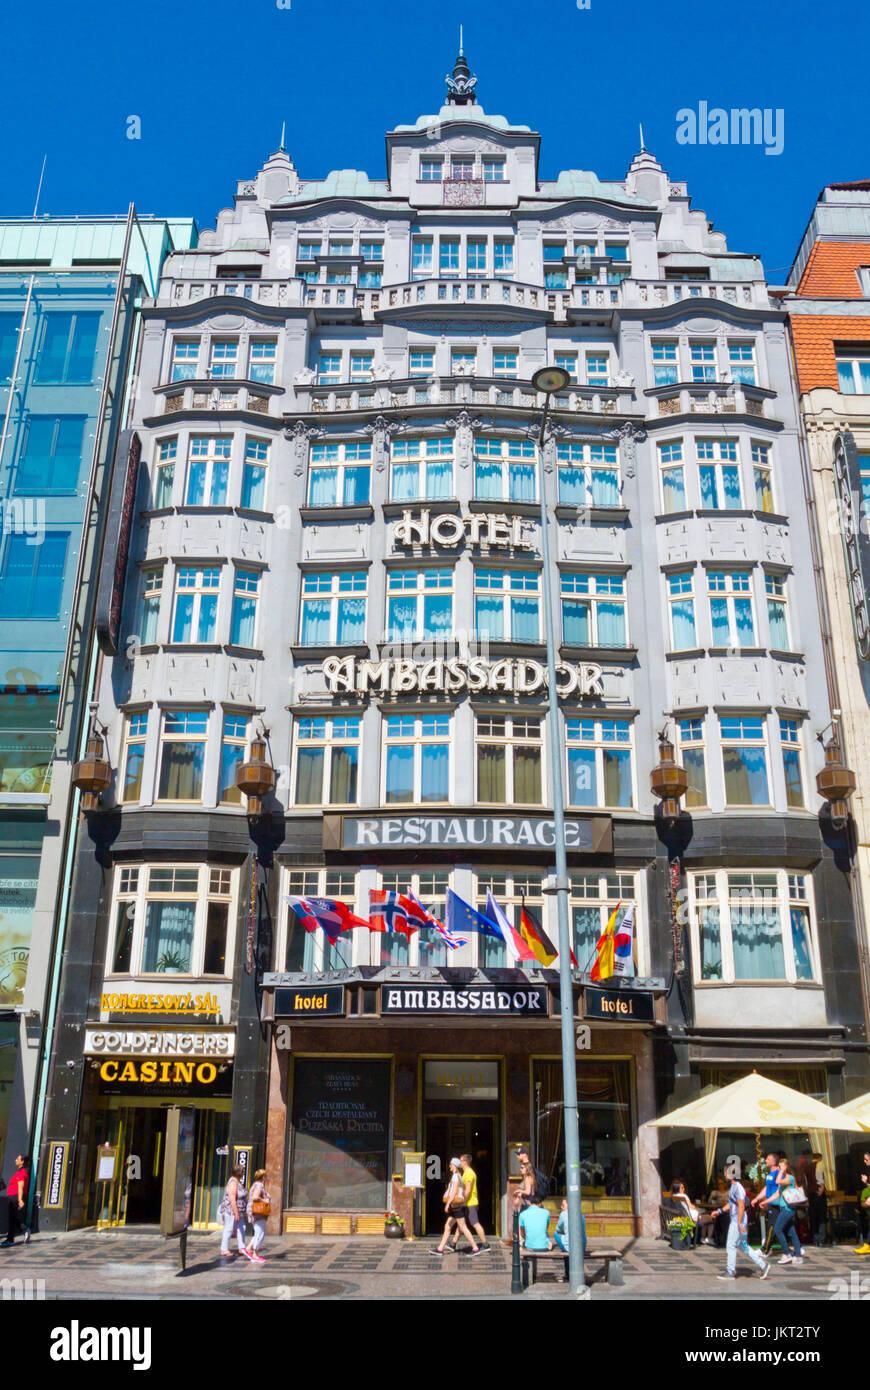 Hotel Ambassador, Vaclavske namesti, Wenceslas square, new town, Prague, Czech Republic - Stock Image